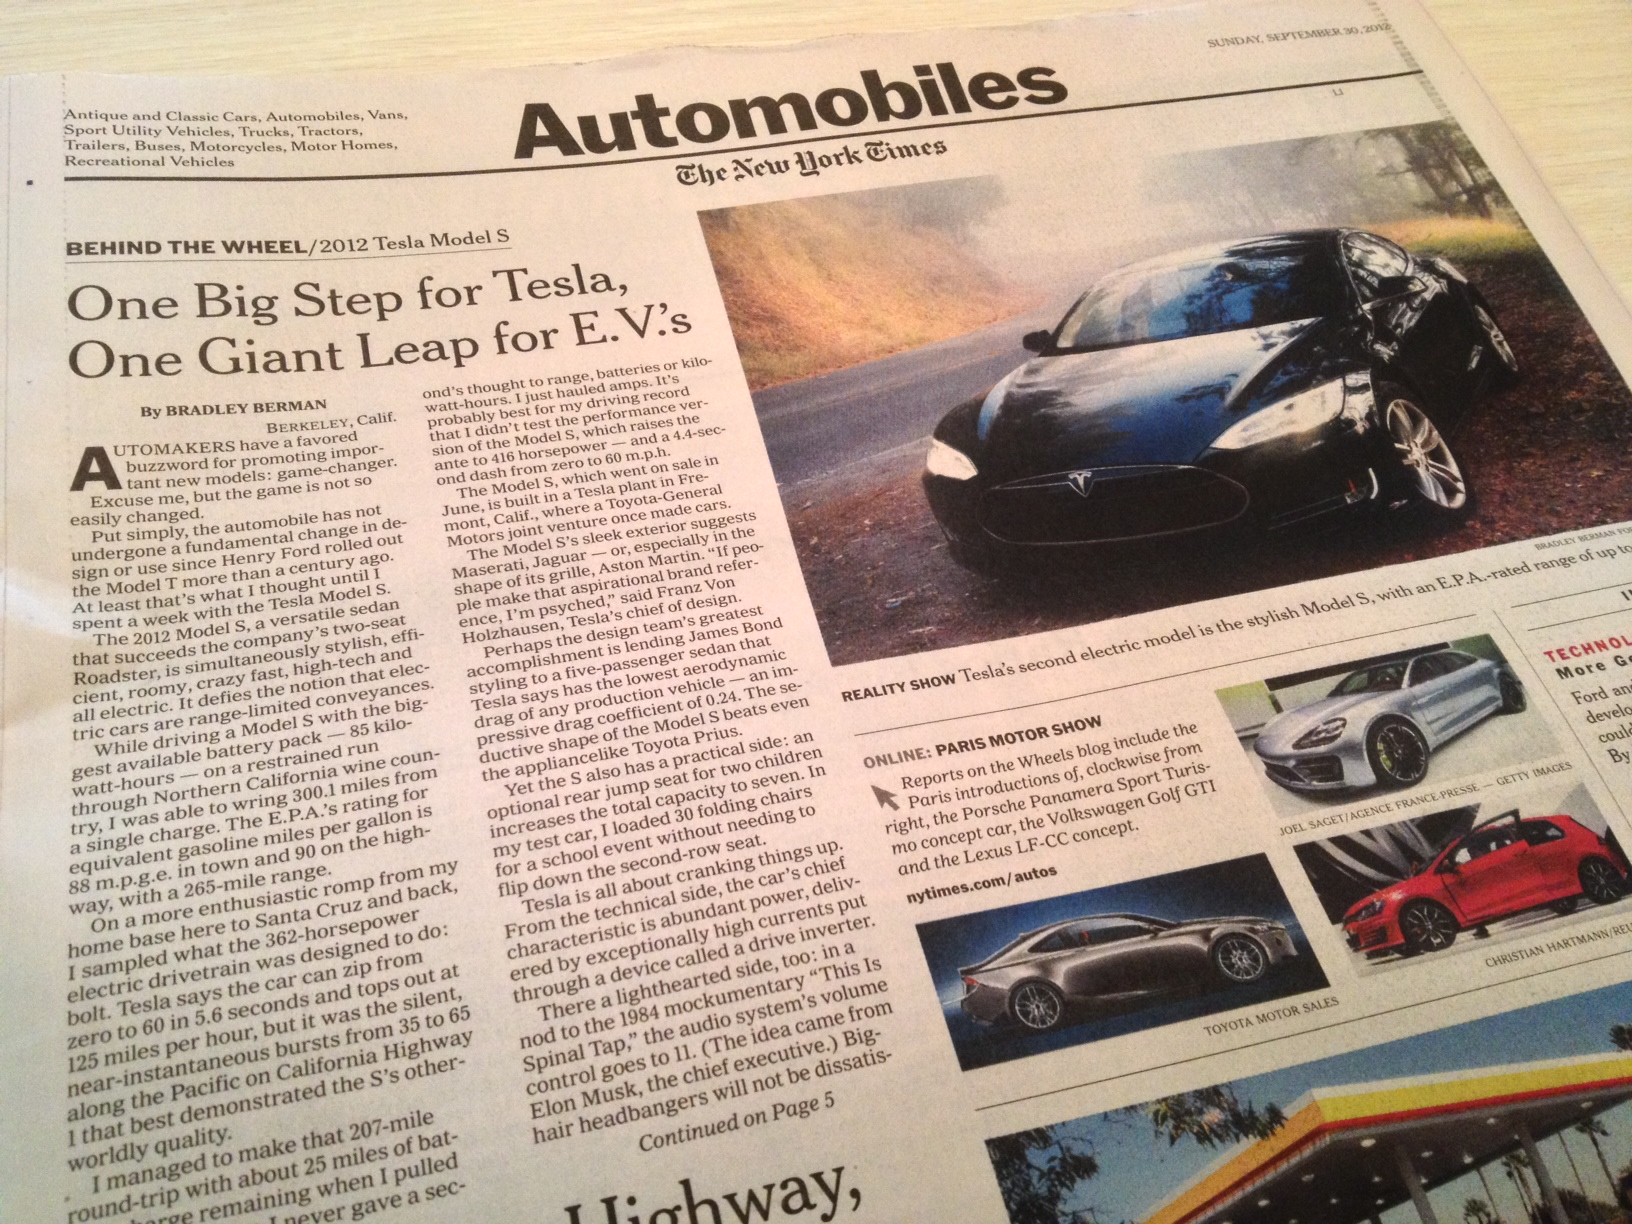 TeslaNewYorkTimesArticle.JPG